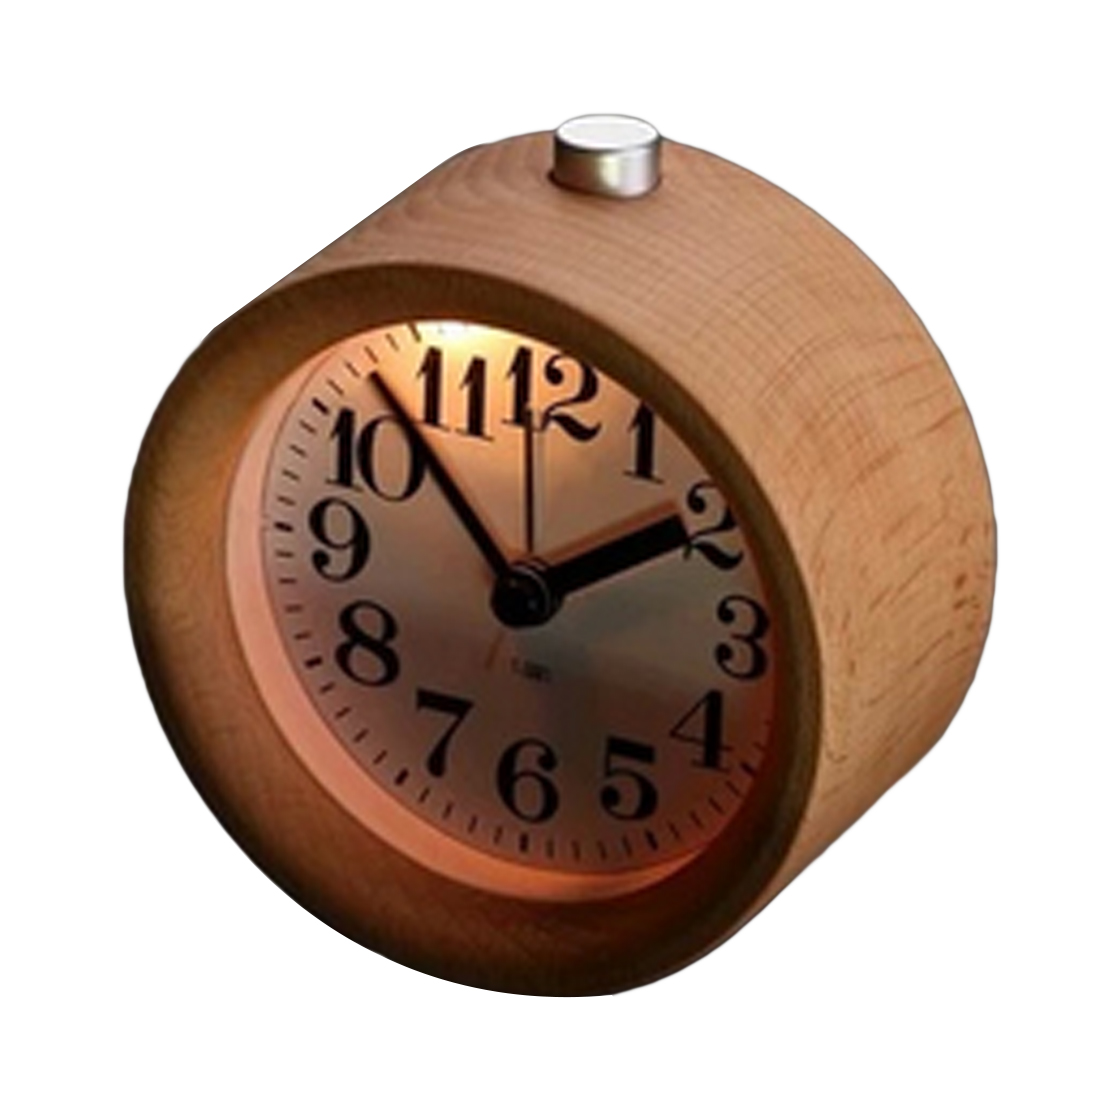 Wooden Alarm Clock Electronic Desktop Clock Digital Clock Circular No Ticking Snooze Backlight Wood Table Watch